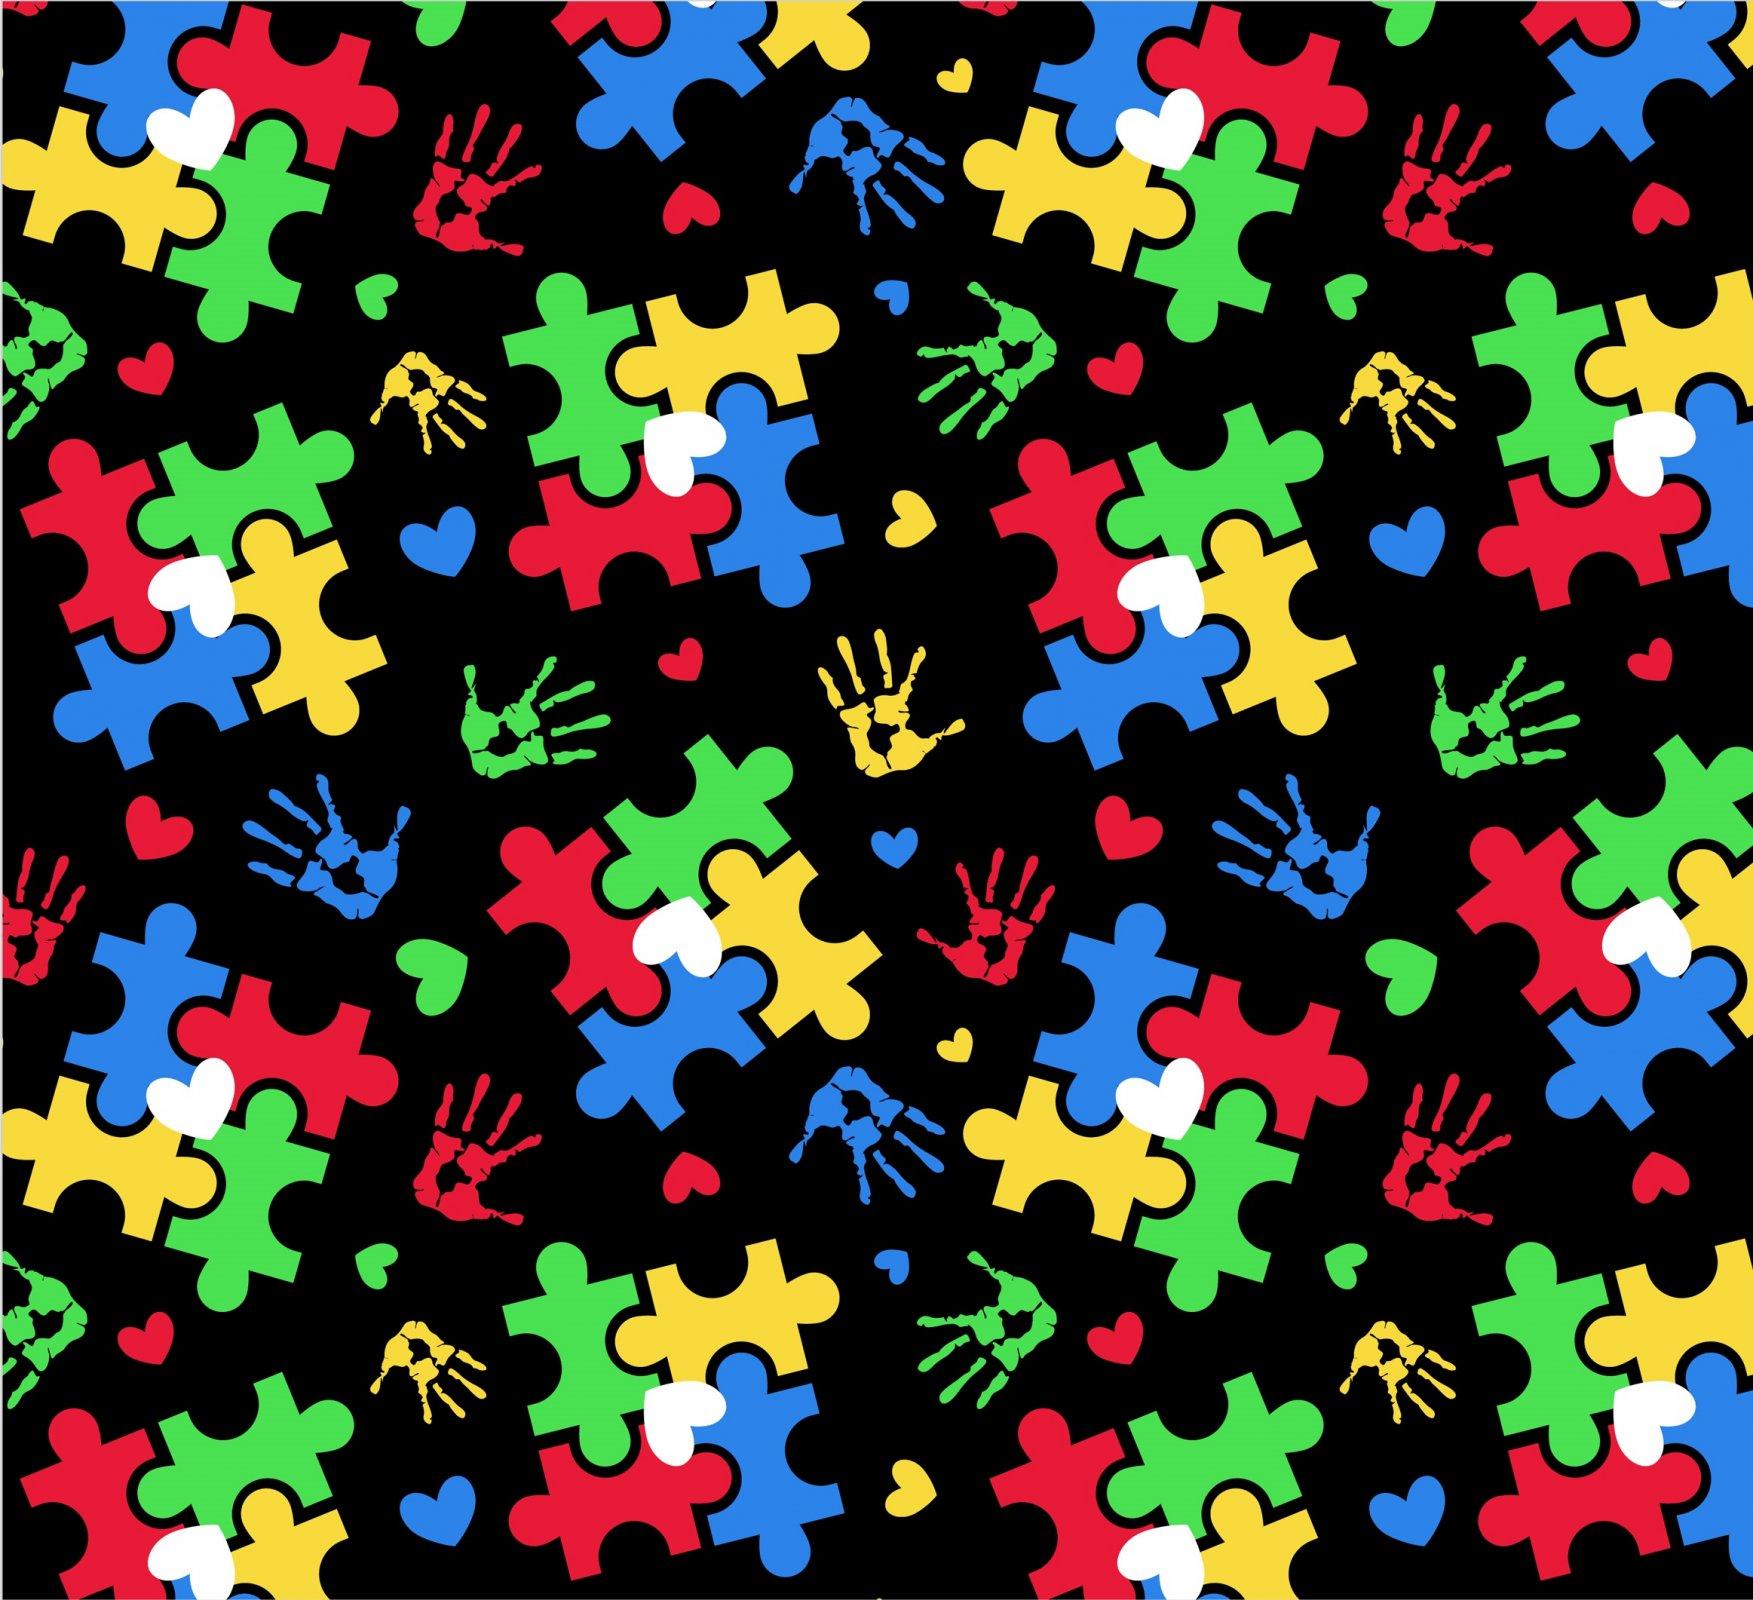 DT-Foust Exclusive Digital Prints DX-2581-0C-2 Black/Multi - Puzzle Toss and Hearts